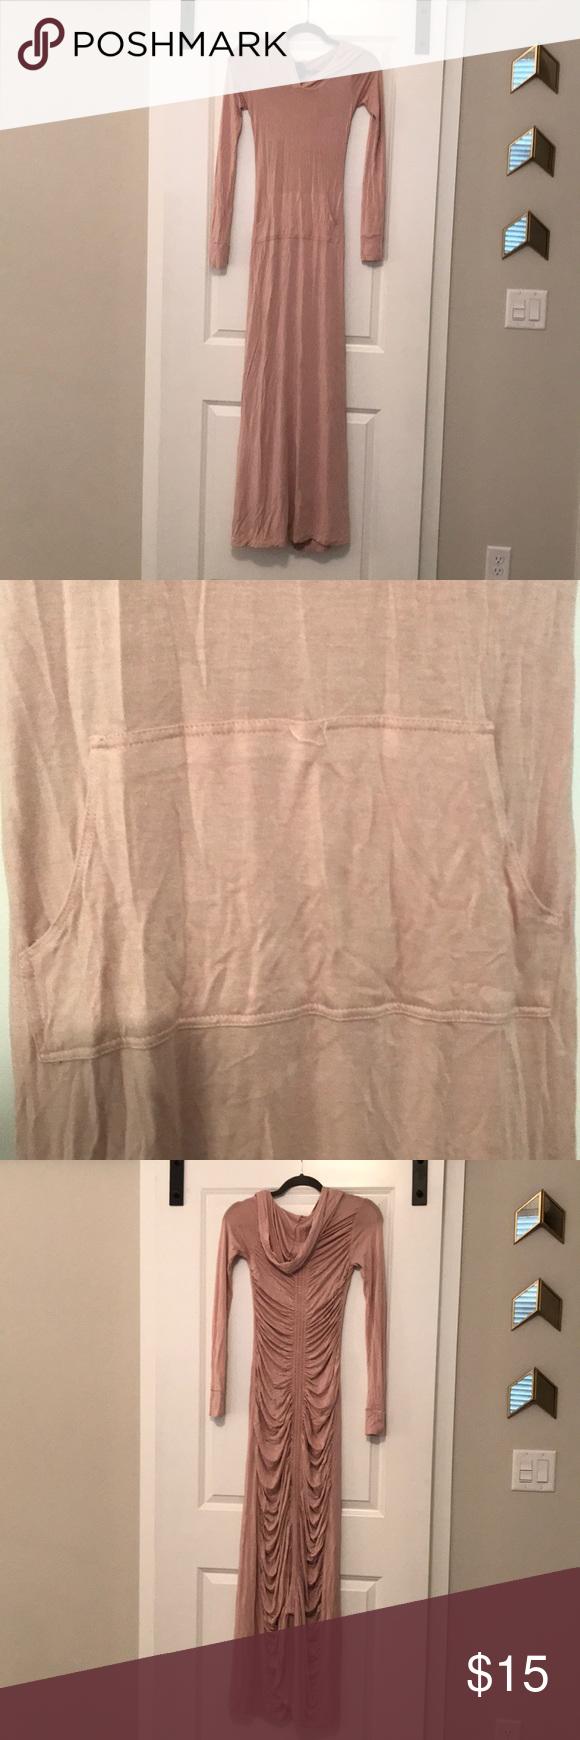 Long sleeve hooded maxi dress